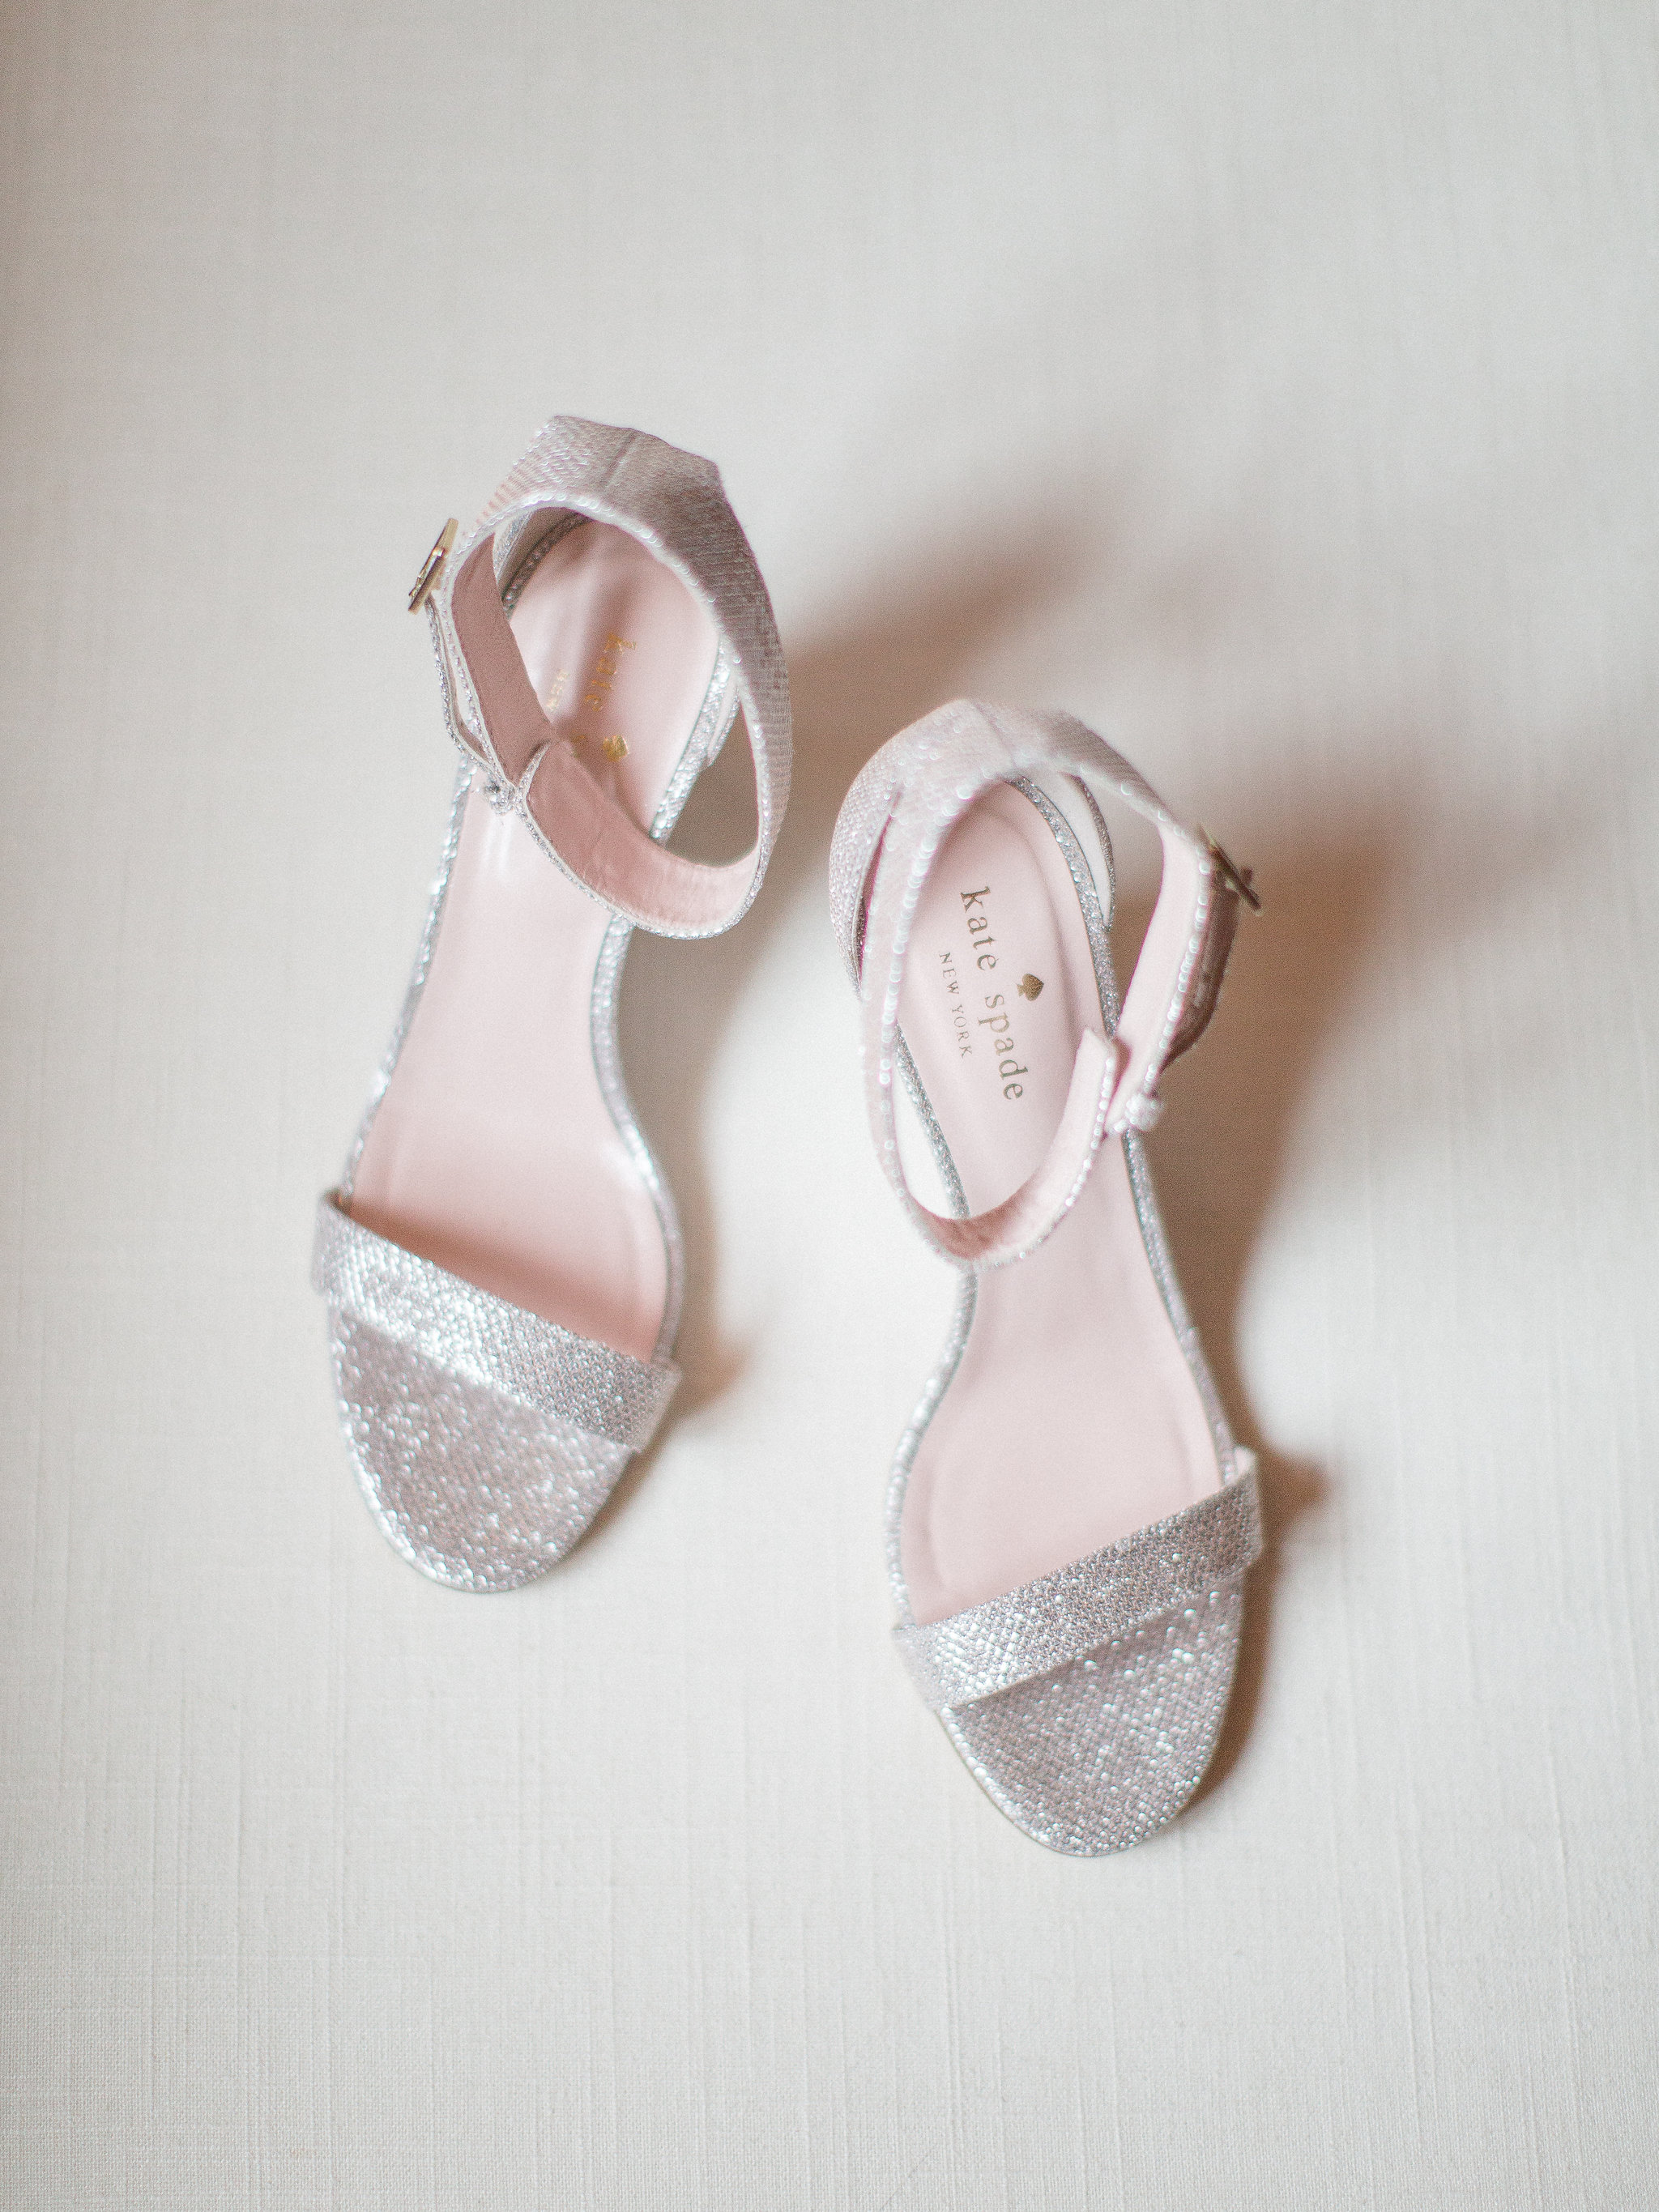 Kate_Spade_Wedding_Shoes.jpg